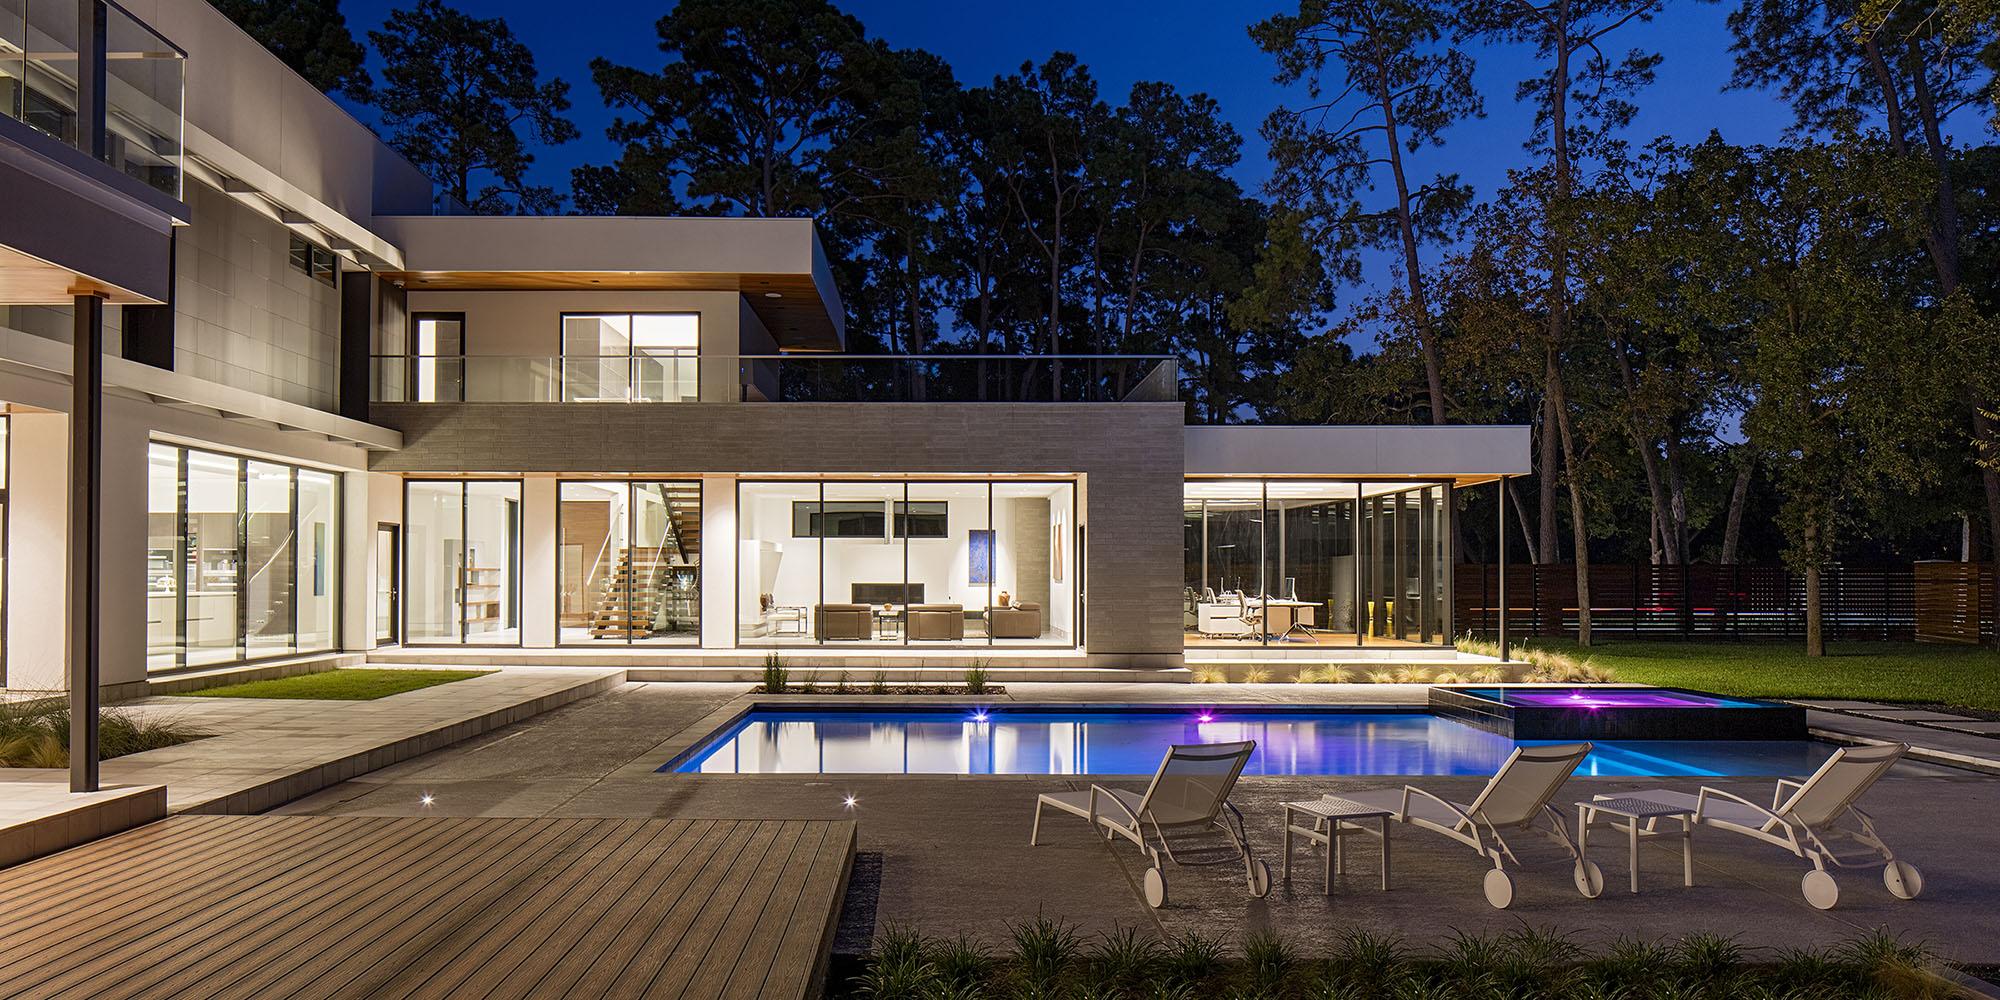 Best Kitchen Gallery: Ma Ds Modern Home Tour Houston Sept 24 2016 of Modern Home Builders Houston  on rachelxblog.com